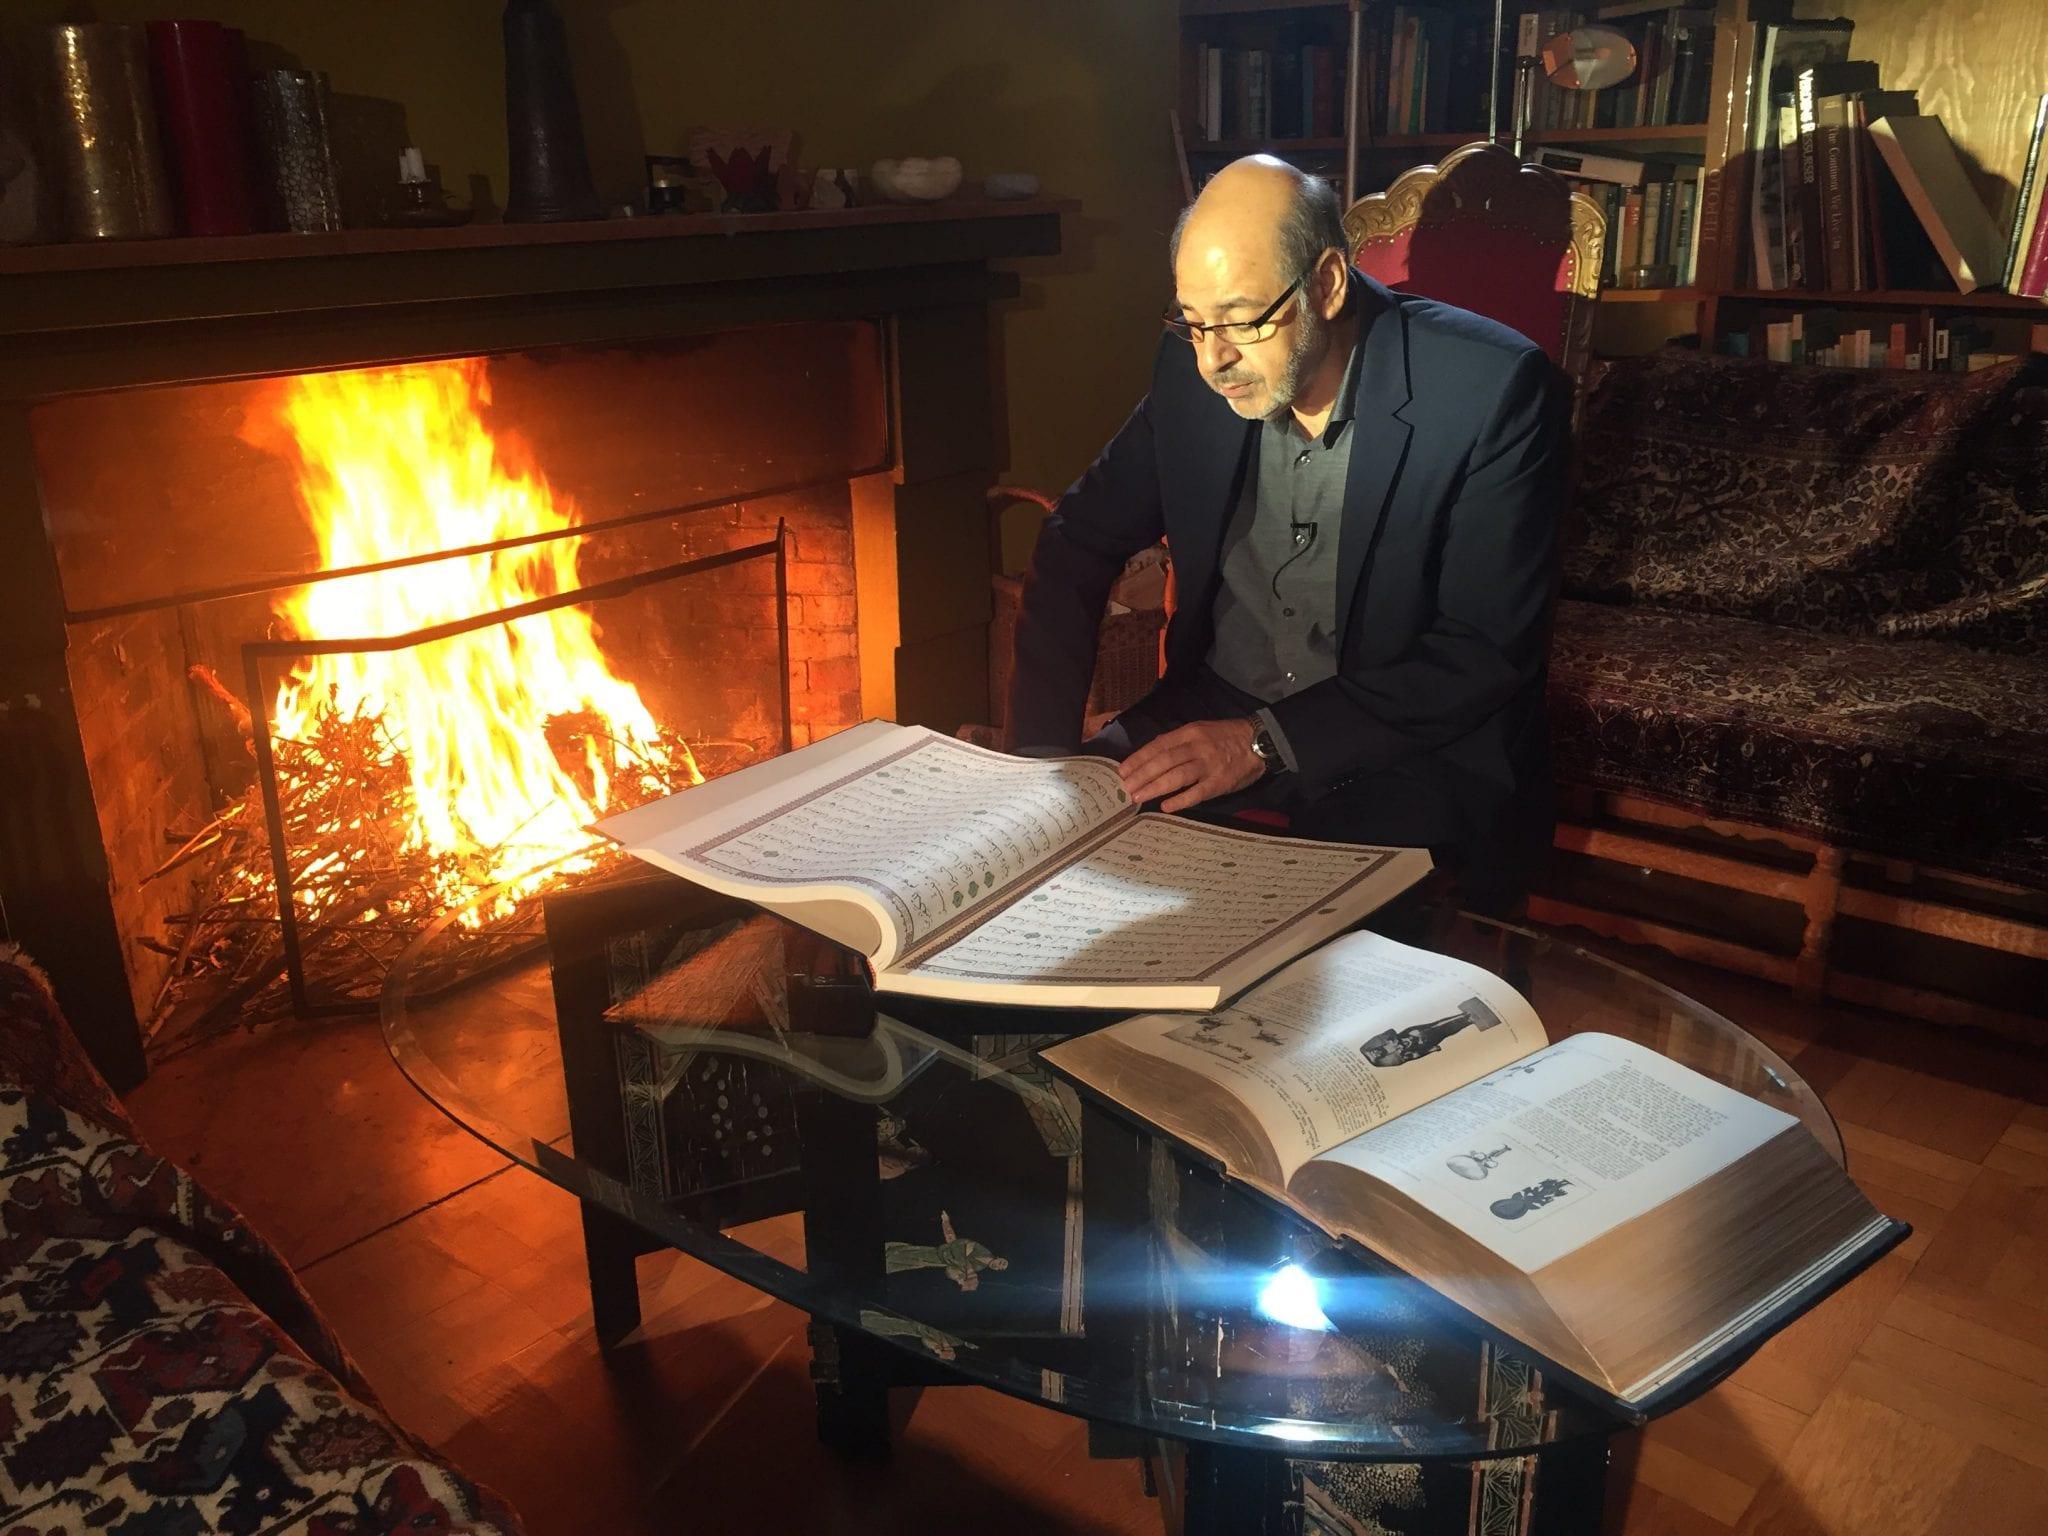 Walid al-Kubaisi i Herland Report opptak. Foto: Herland Report.